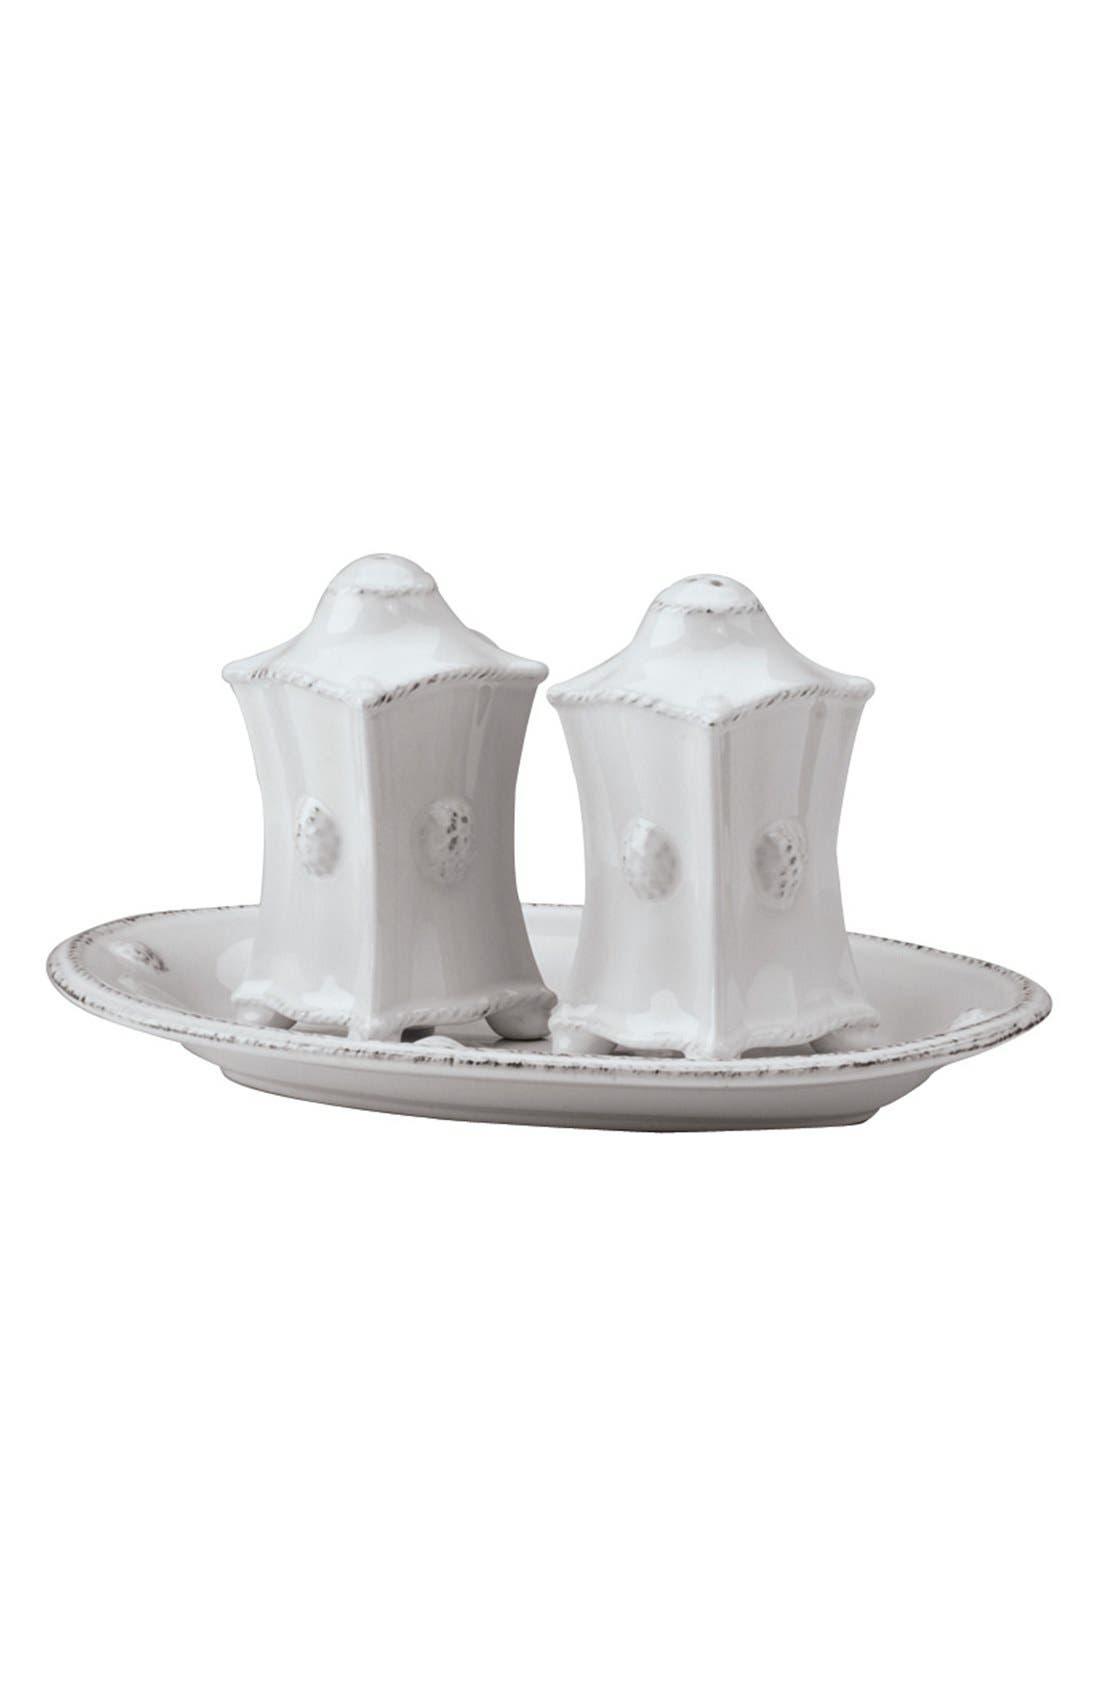 'Berry and Thread' CeramicSalt & Pepper Shakers,                         Main,                         color, 100